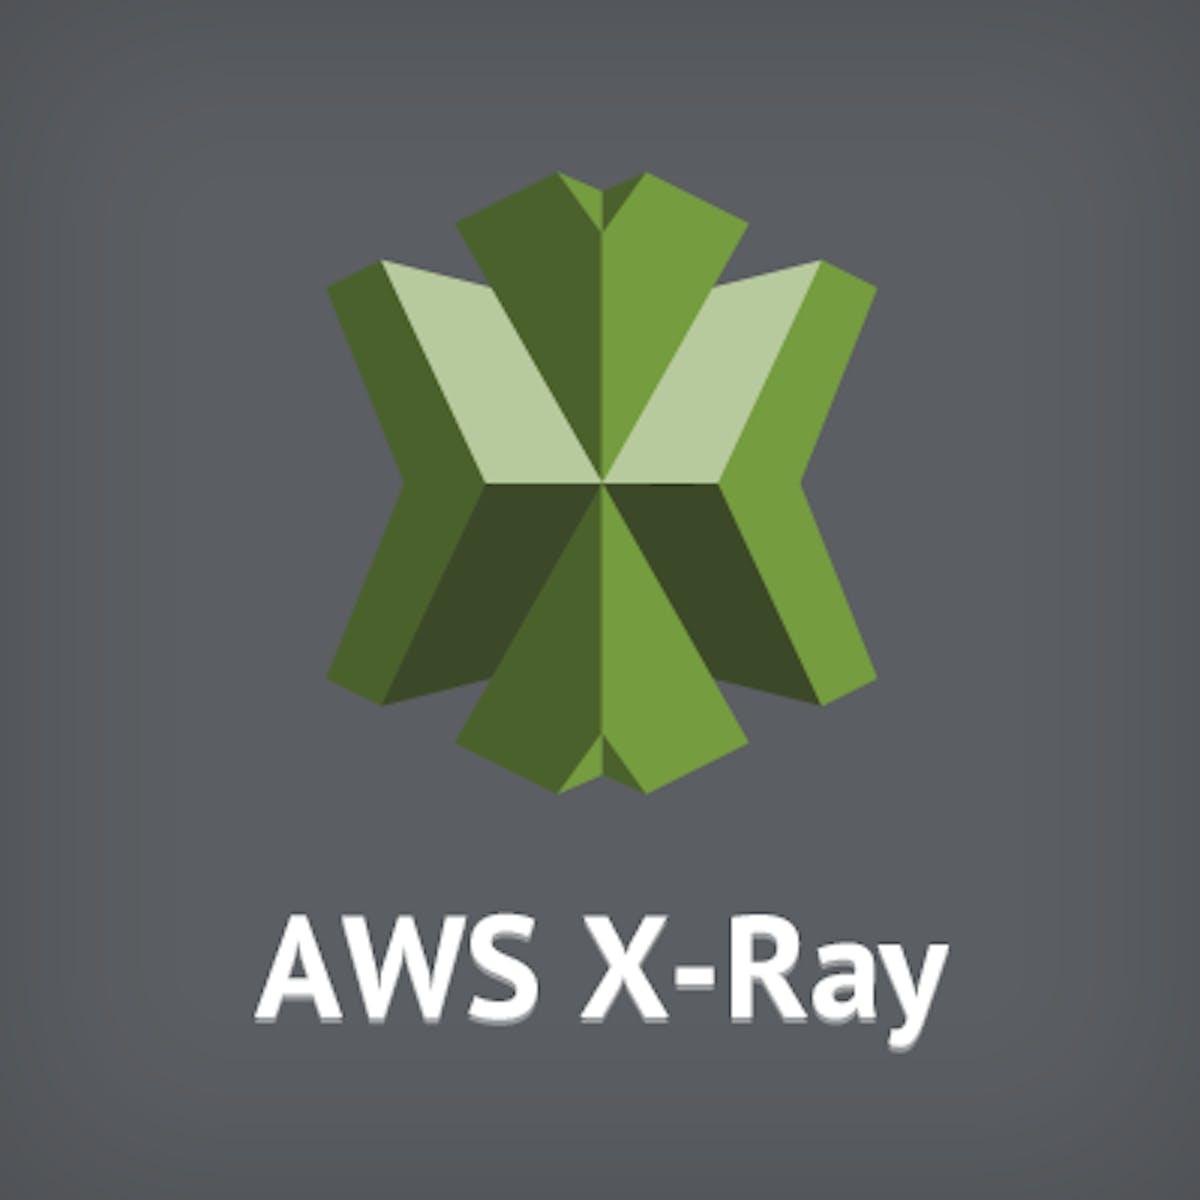 aws x-ray logo